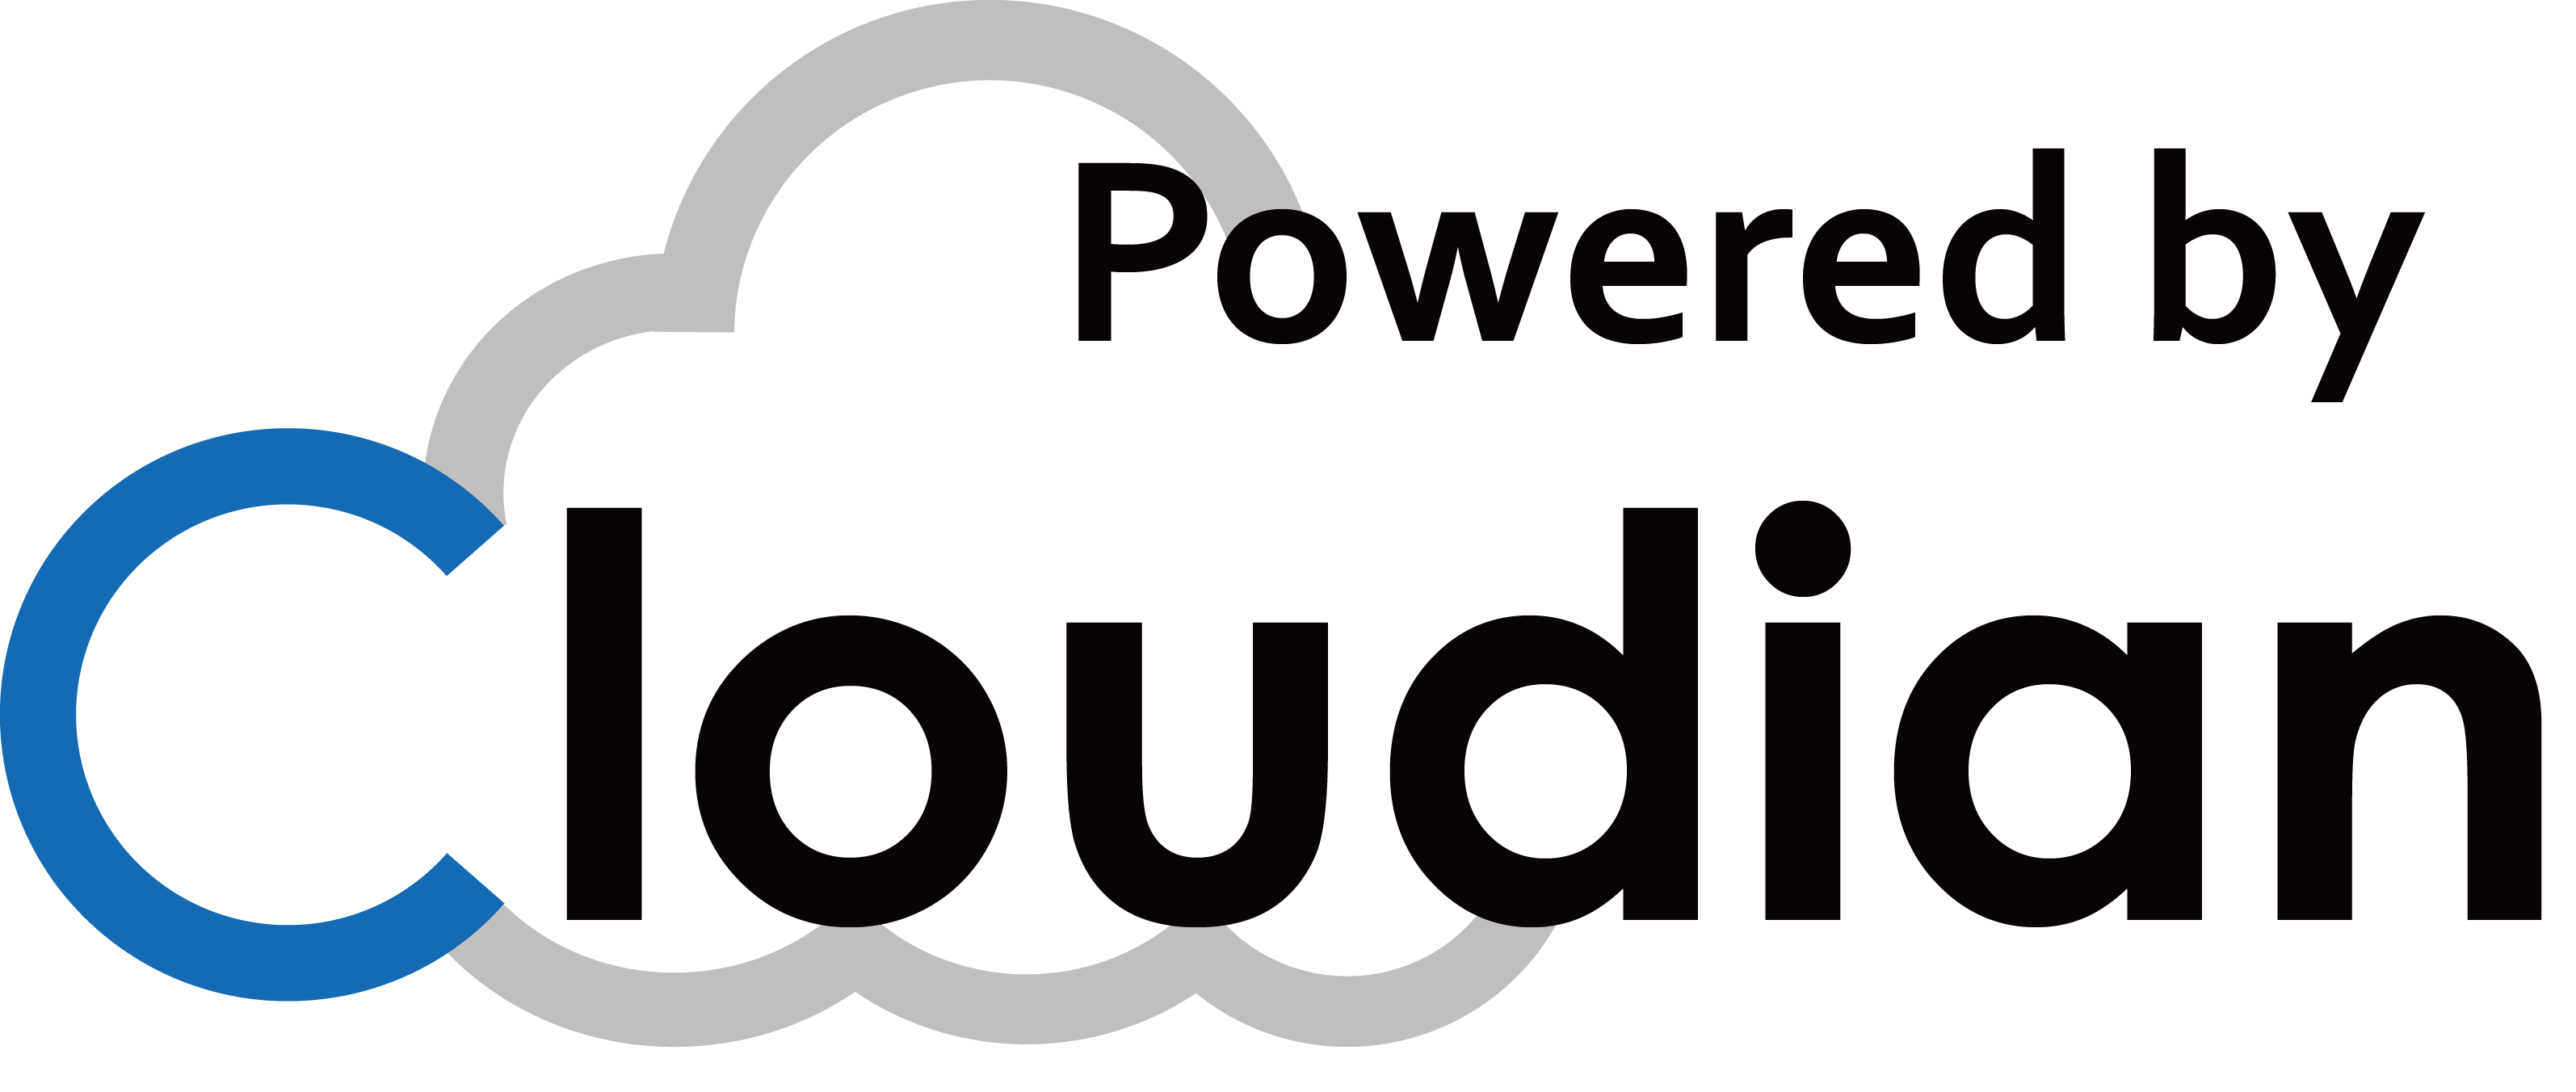 Cloudian Logo.png